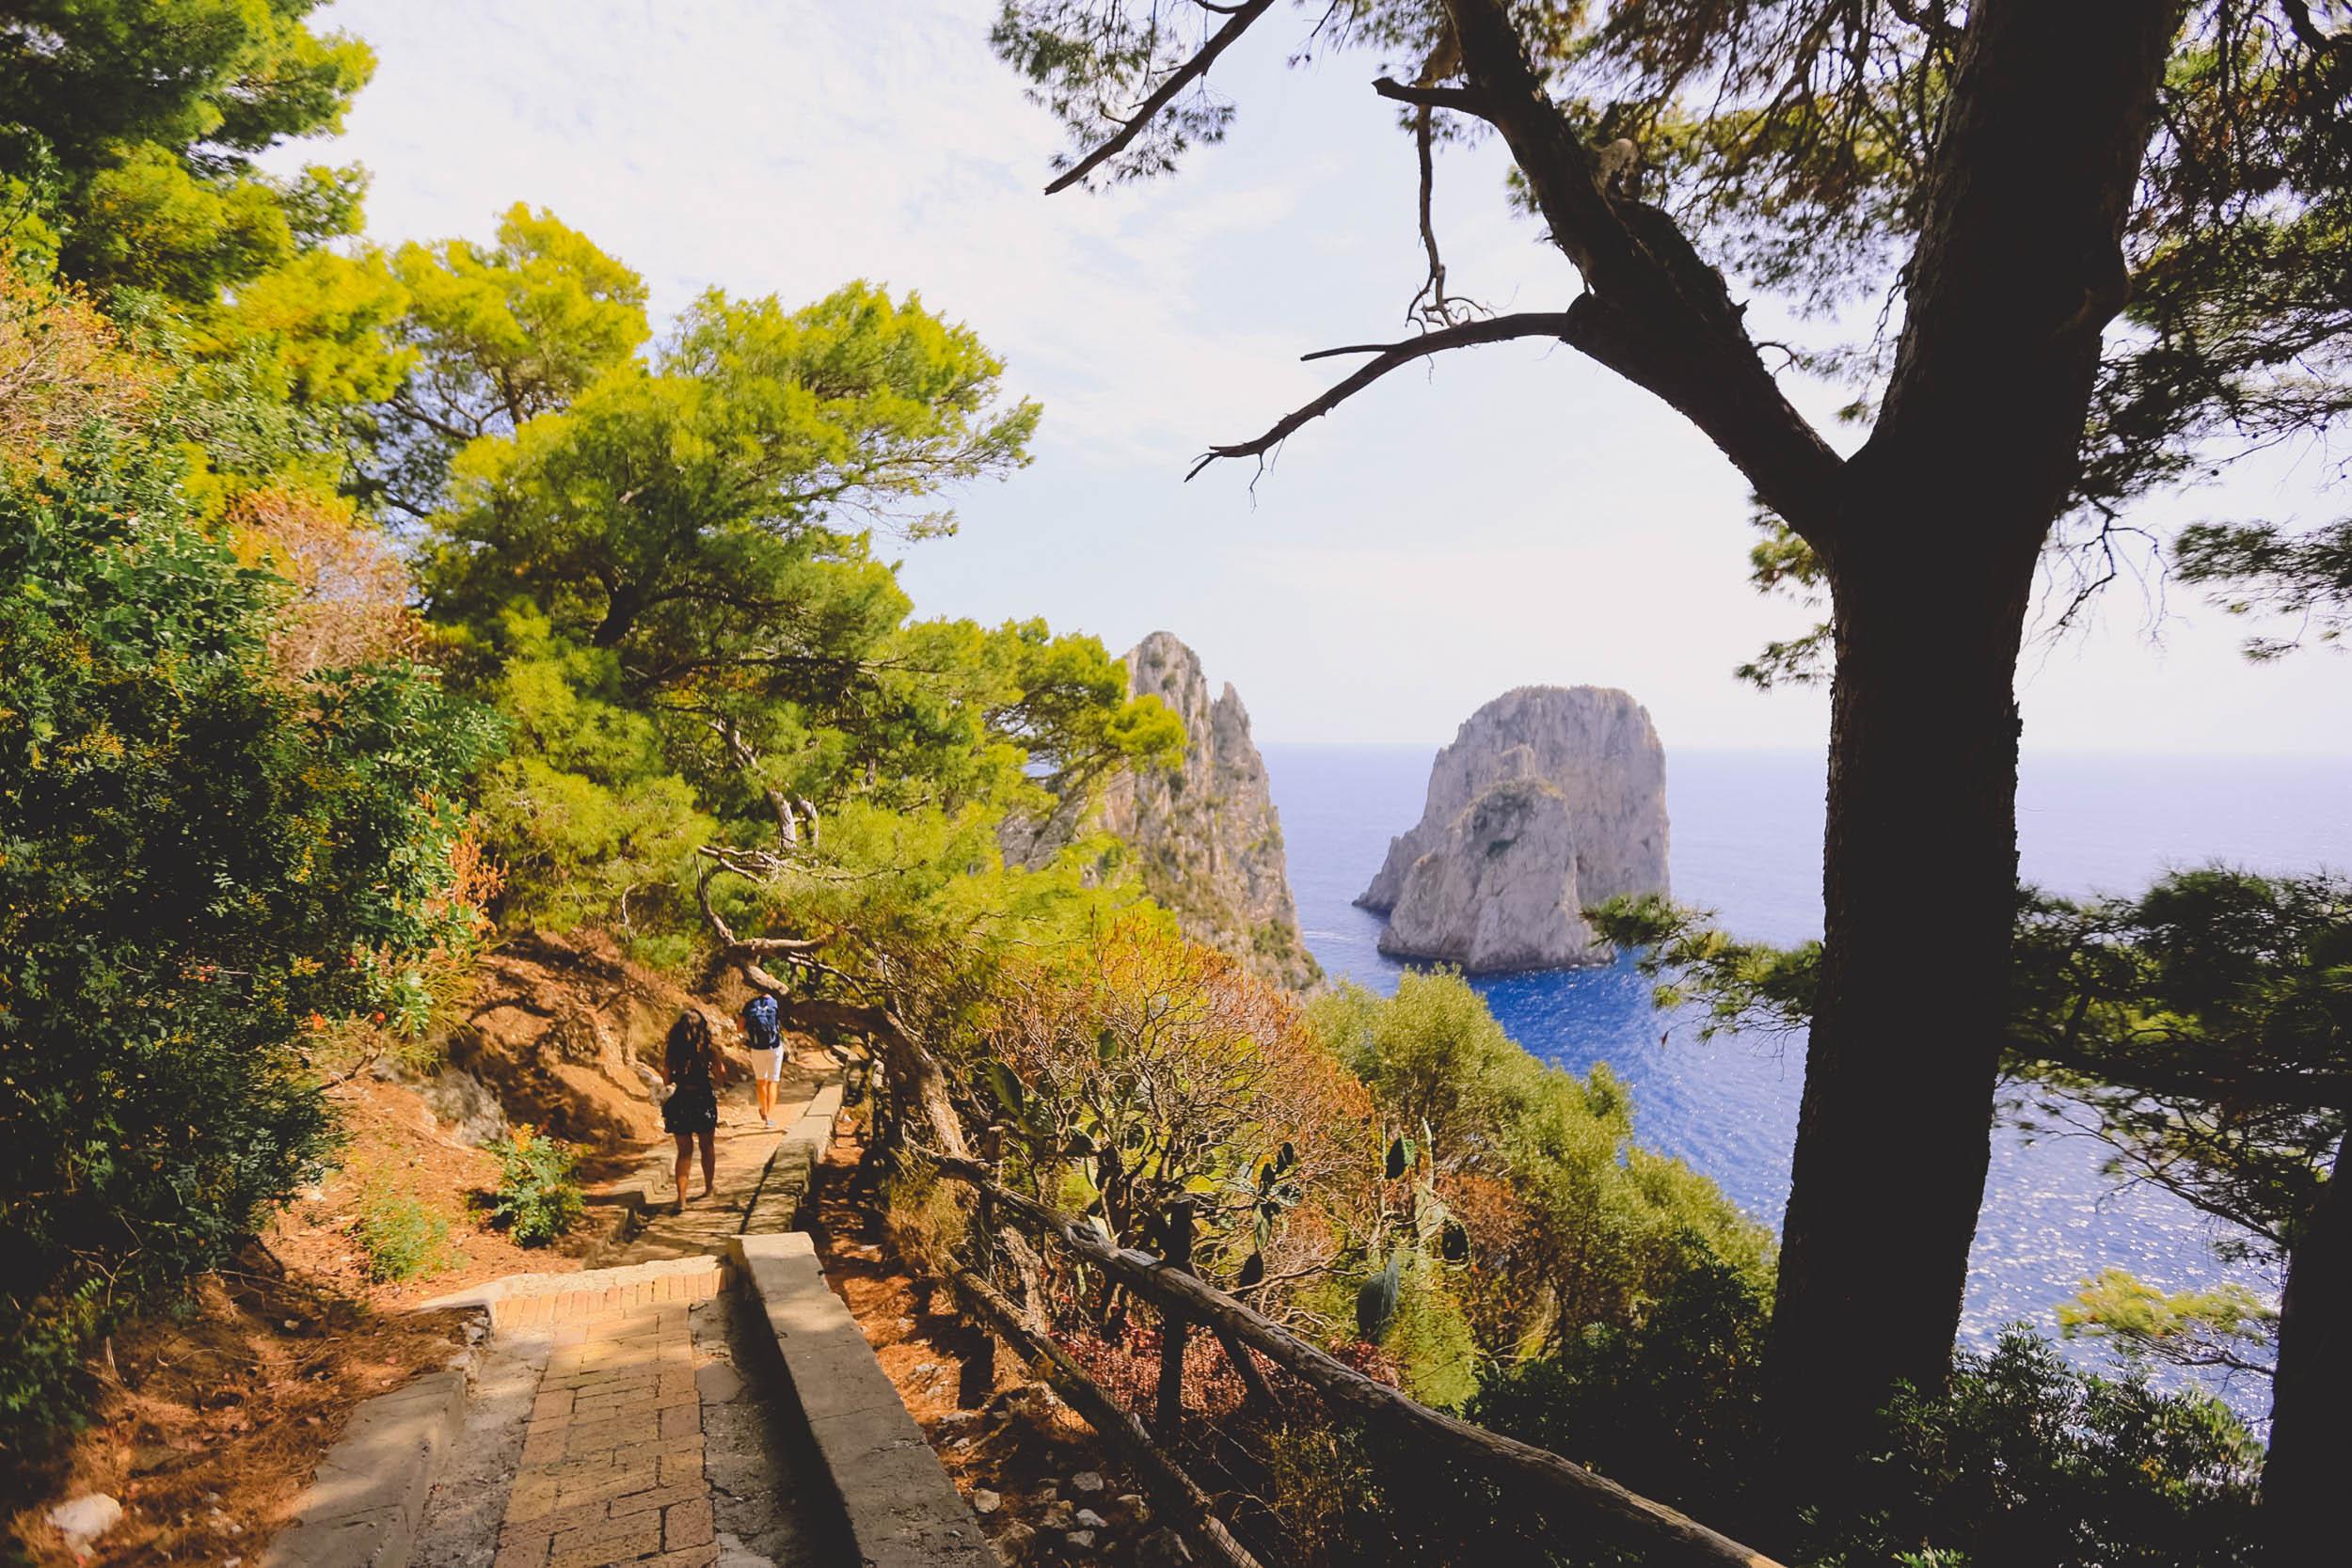 The hike down to La Fontelina